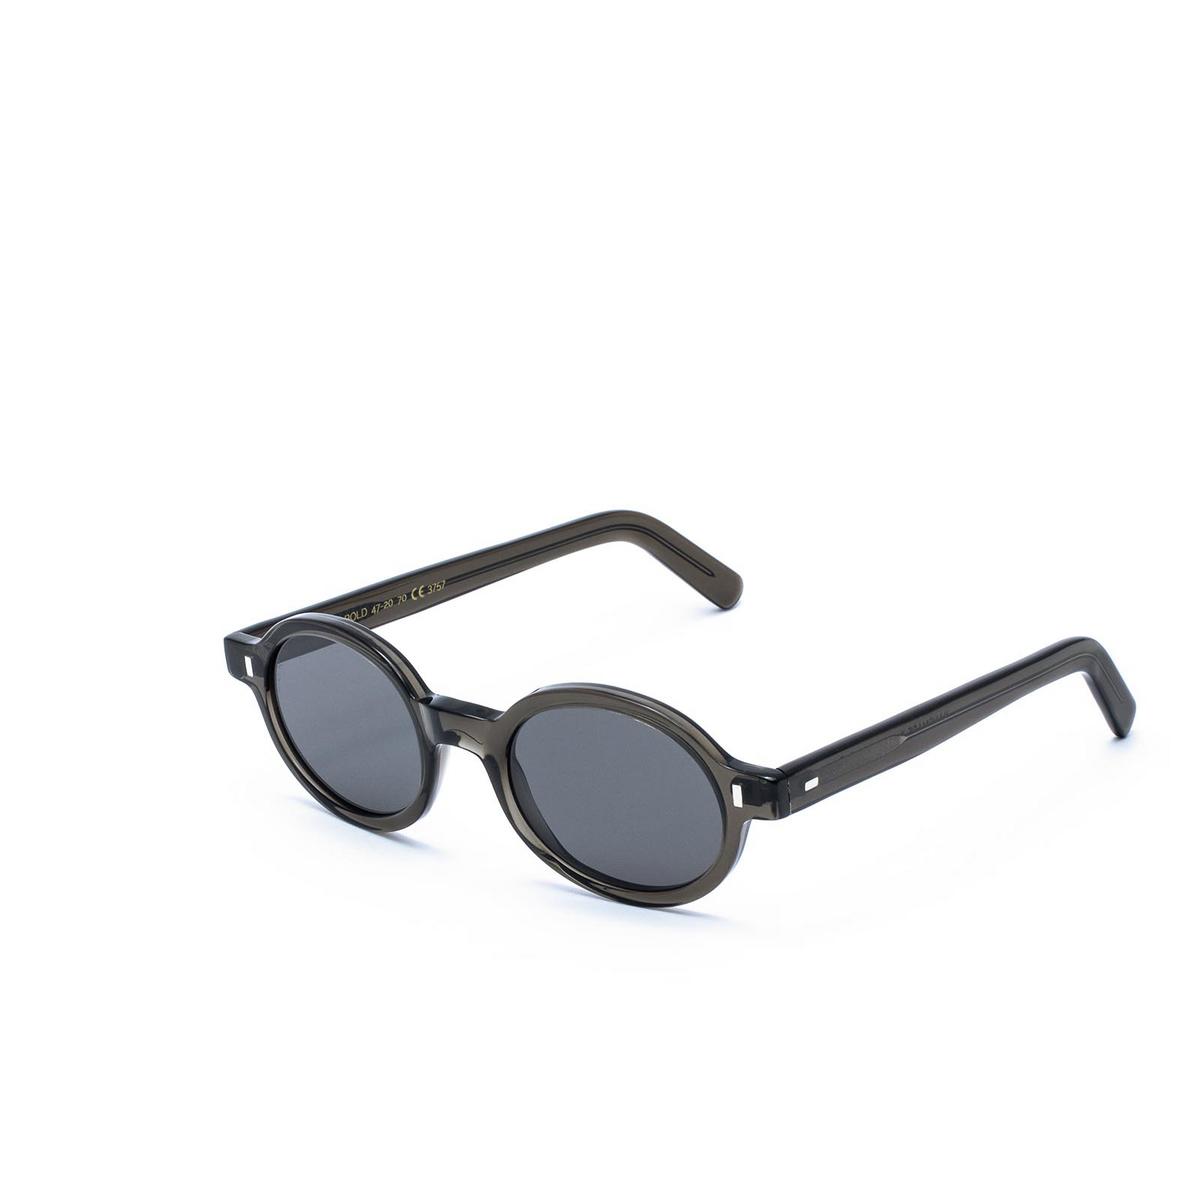 L.G.R® Oval Sunglasses: Teos Bold color Grey 70 - three-quarters view.